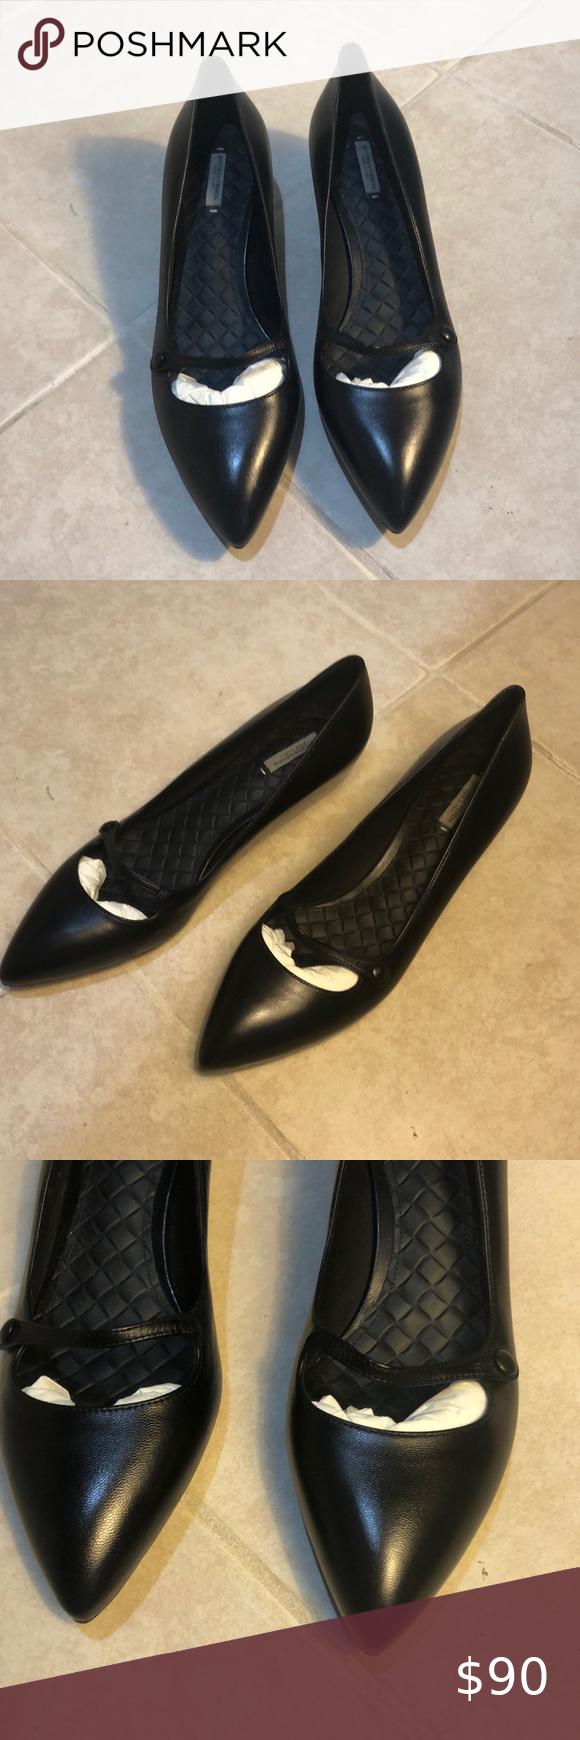 Bottega Veneta Kitten Heels Nwot 39 In 2020 Shoes Women Heels Kitten Heels Heels